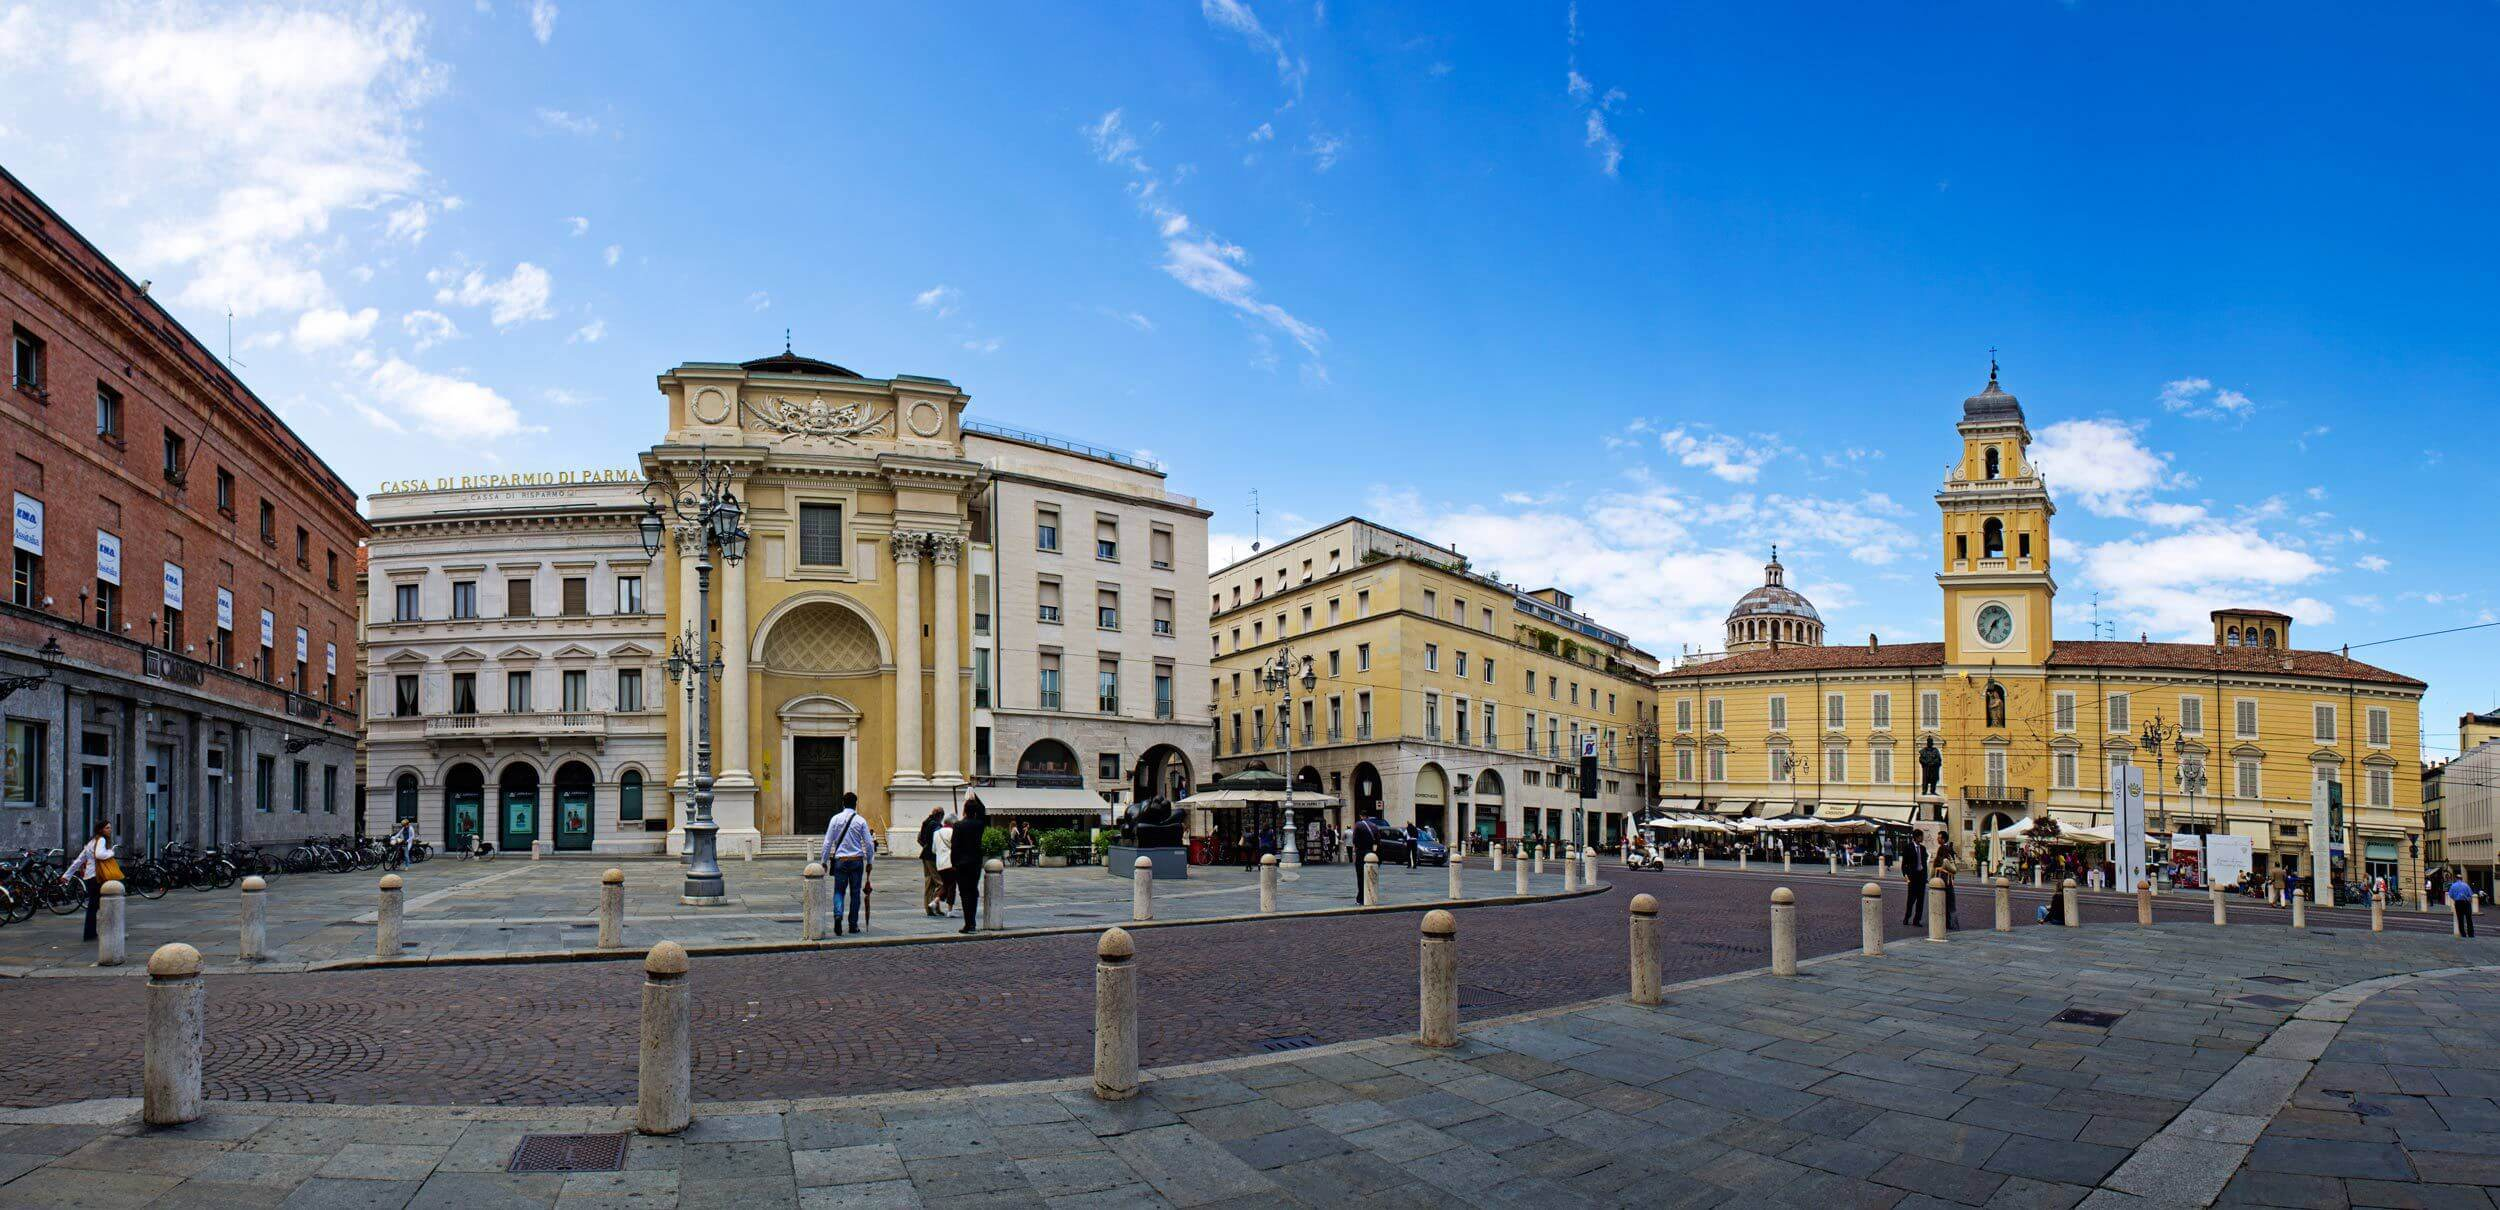 Cheap flights to Parma